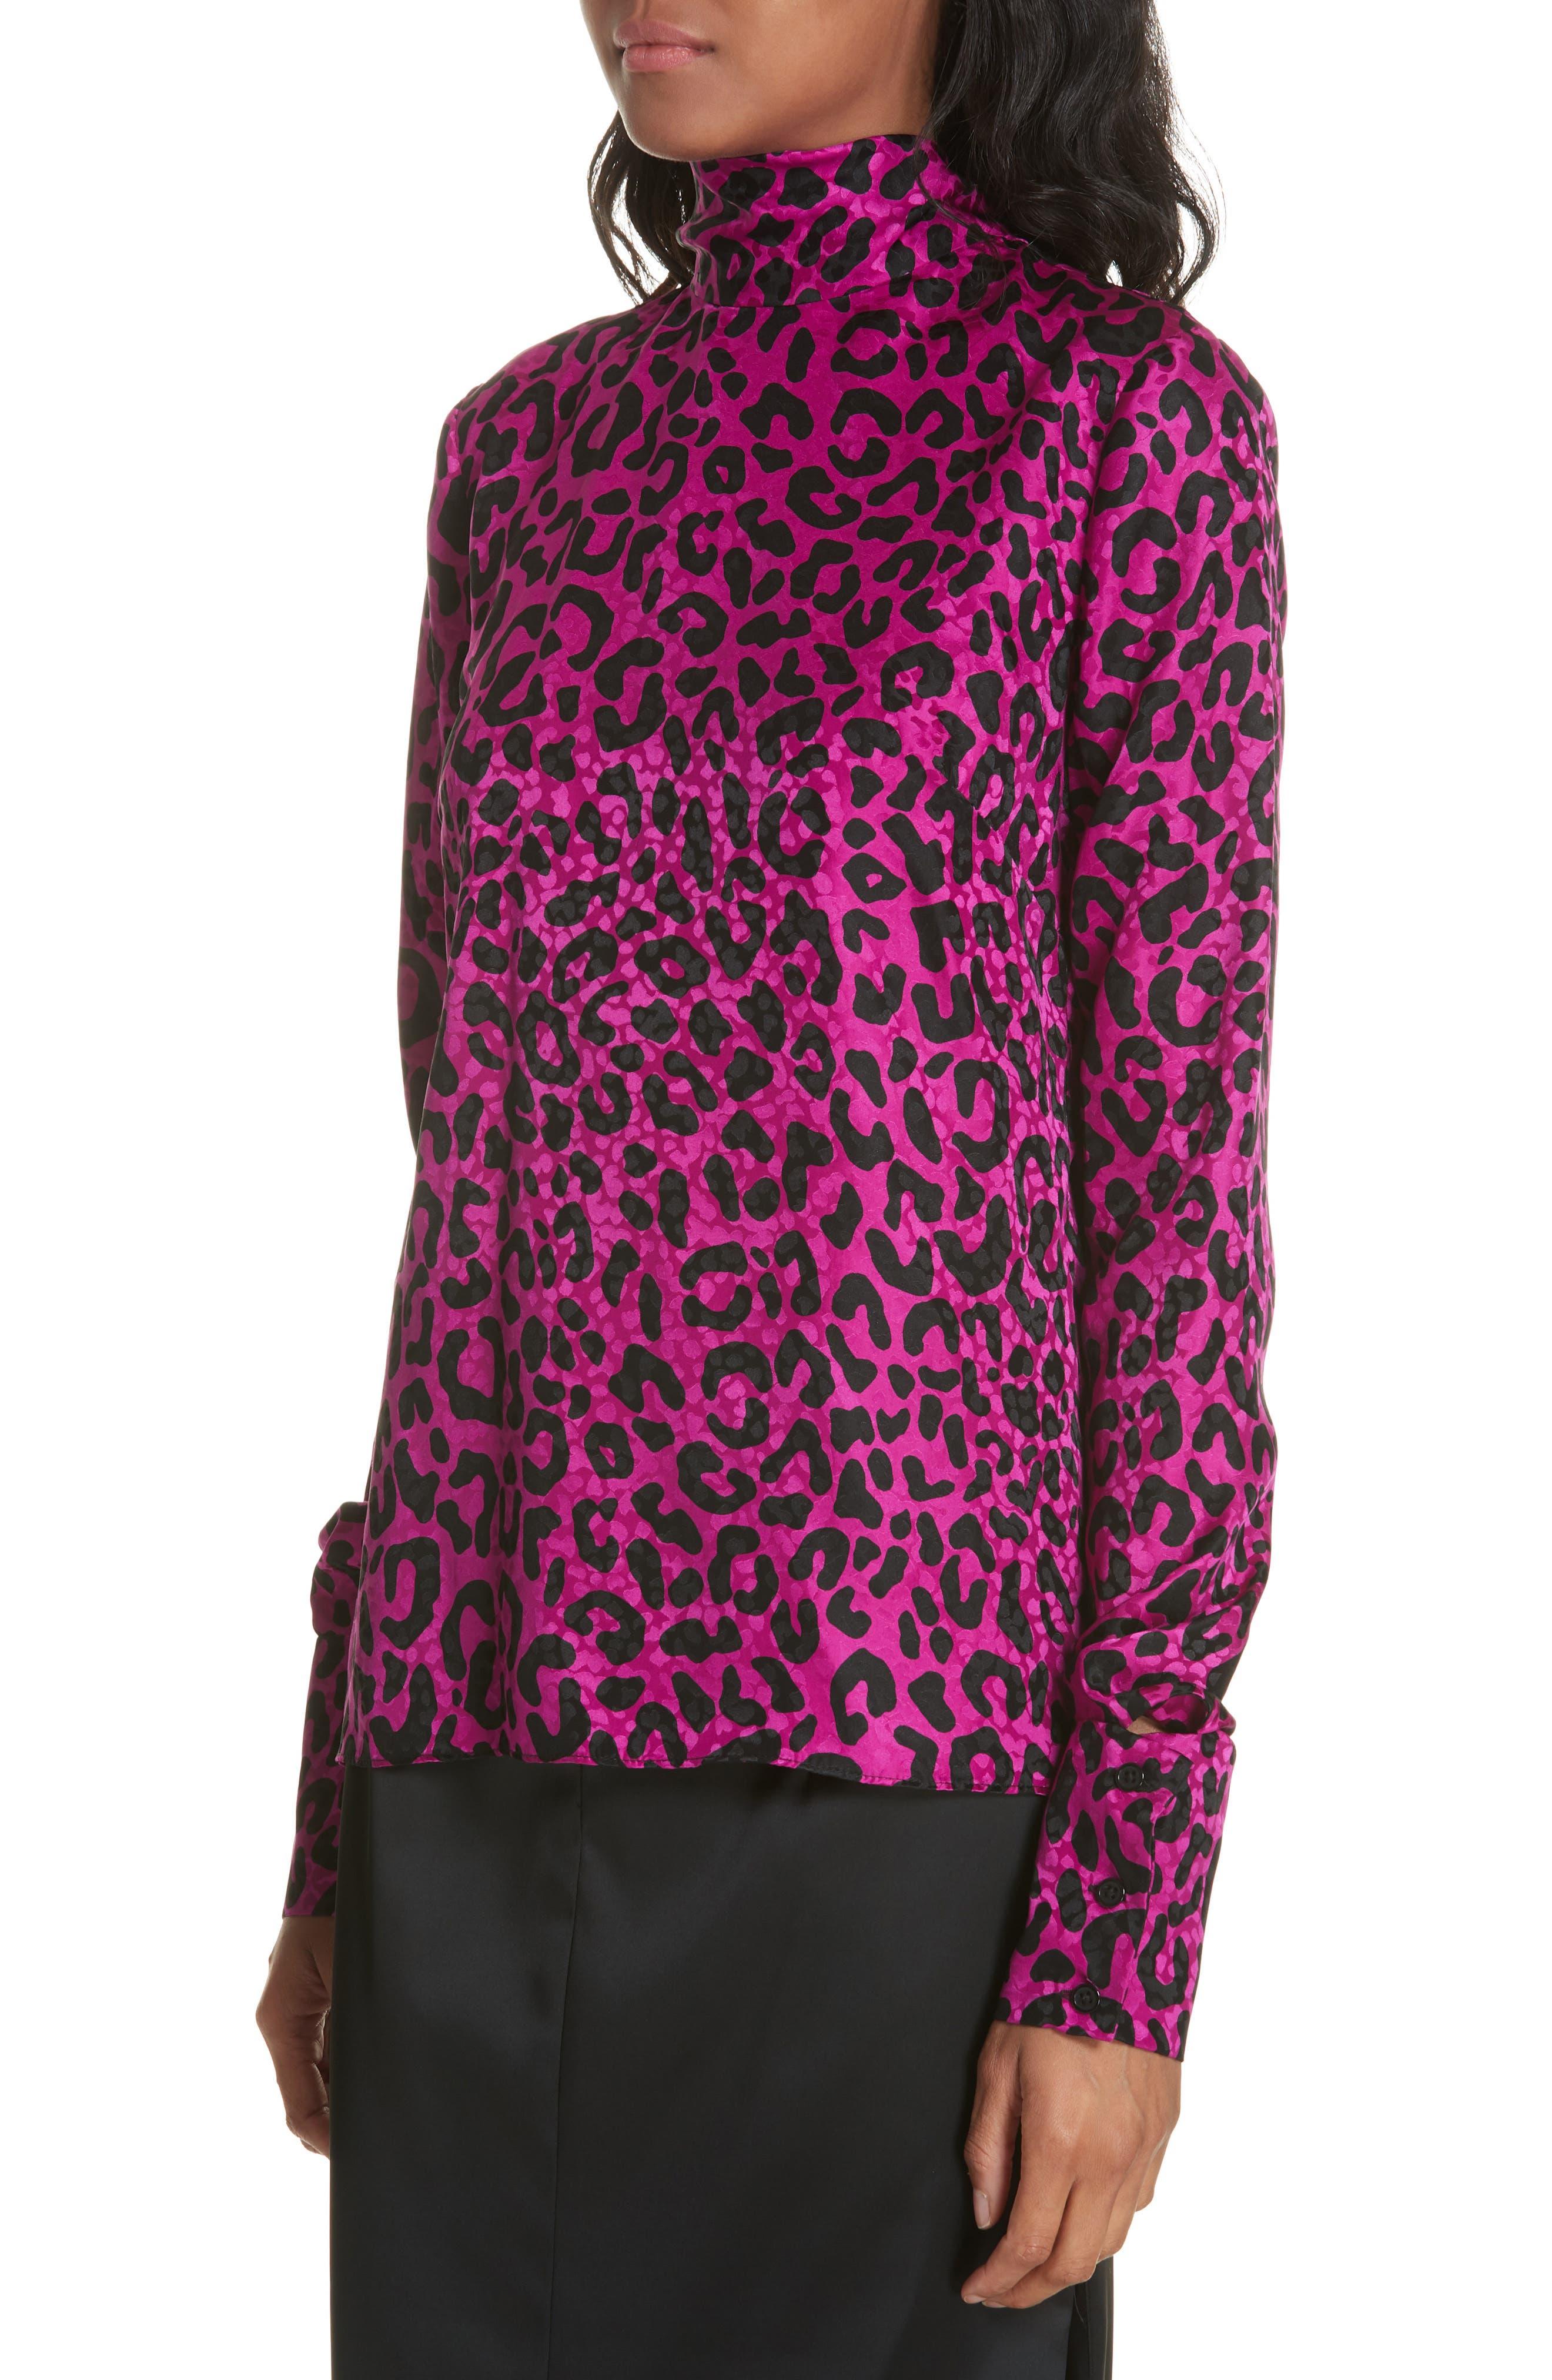 Leopard Print Silk Jacquard Top,                             Alternate thumbnail 4, color,                             673